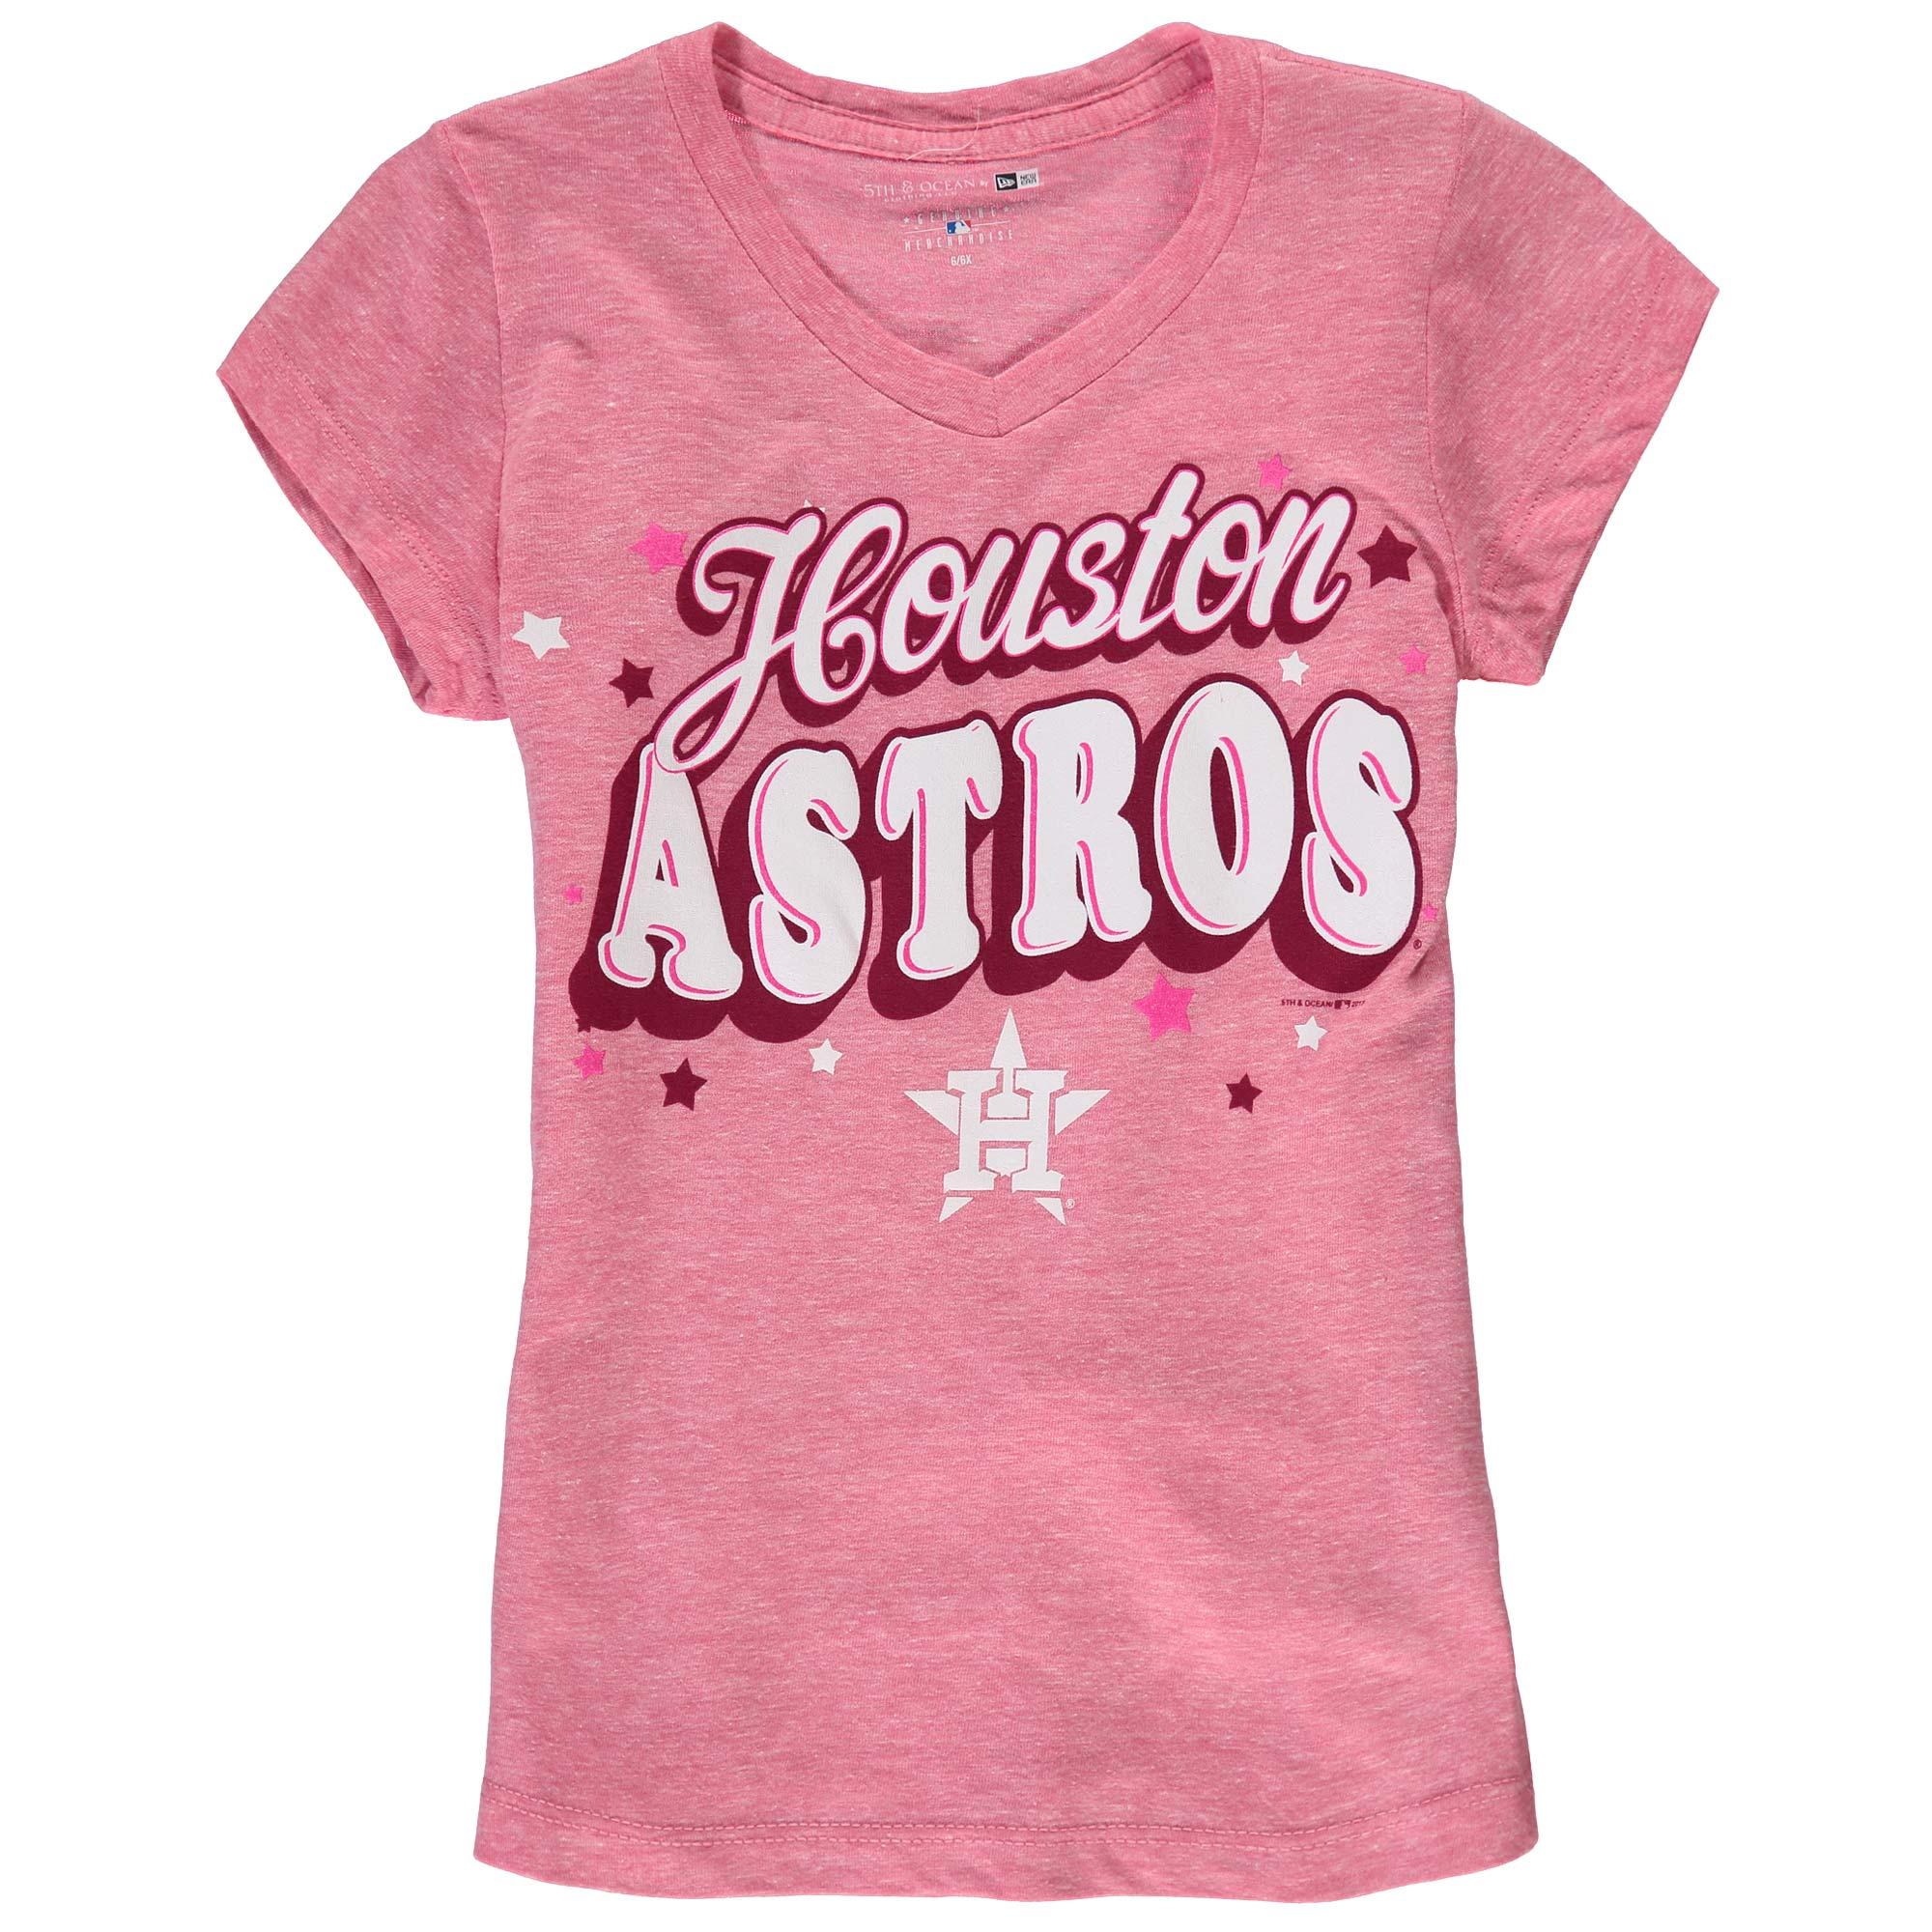 Houston Astros 5th & Ocean by New Era Girls Youth Stars Tri-Blend V-Neck T-Shirt - Pink